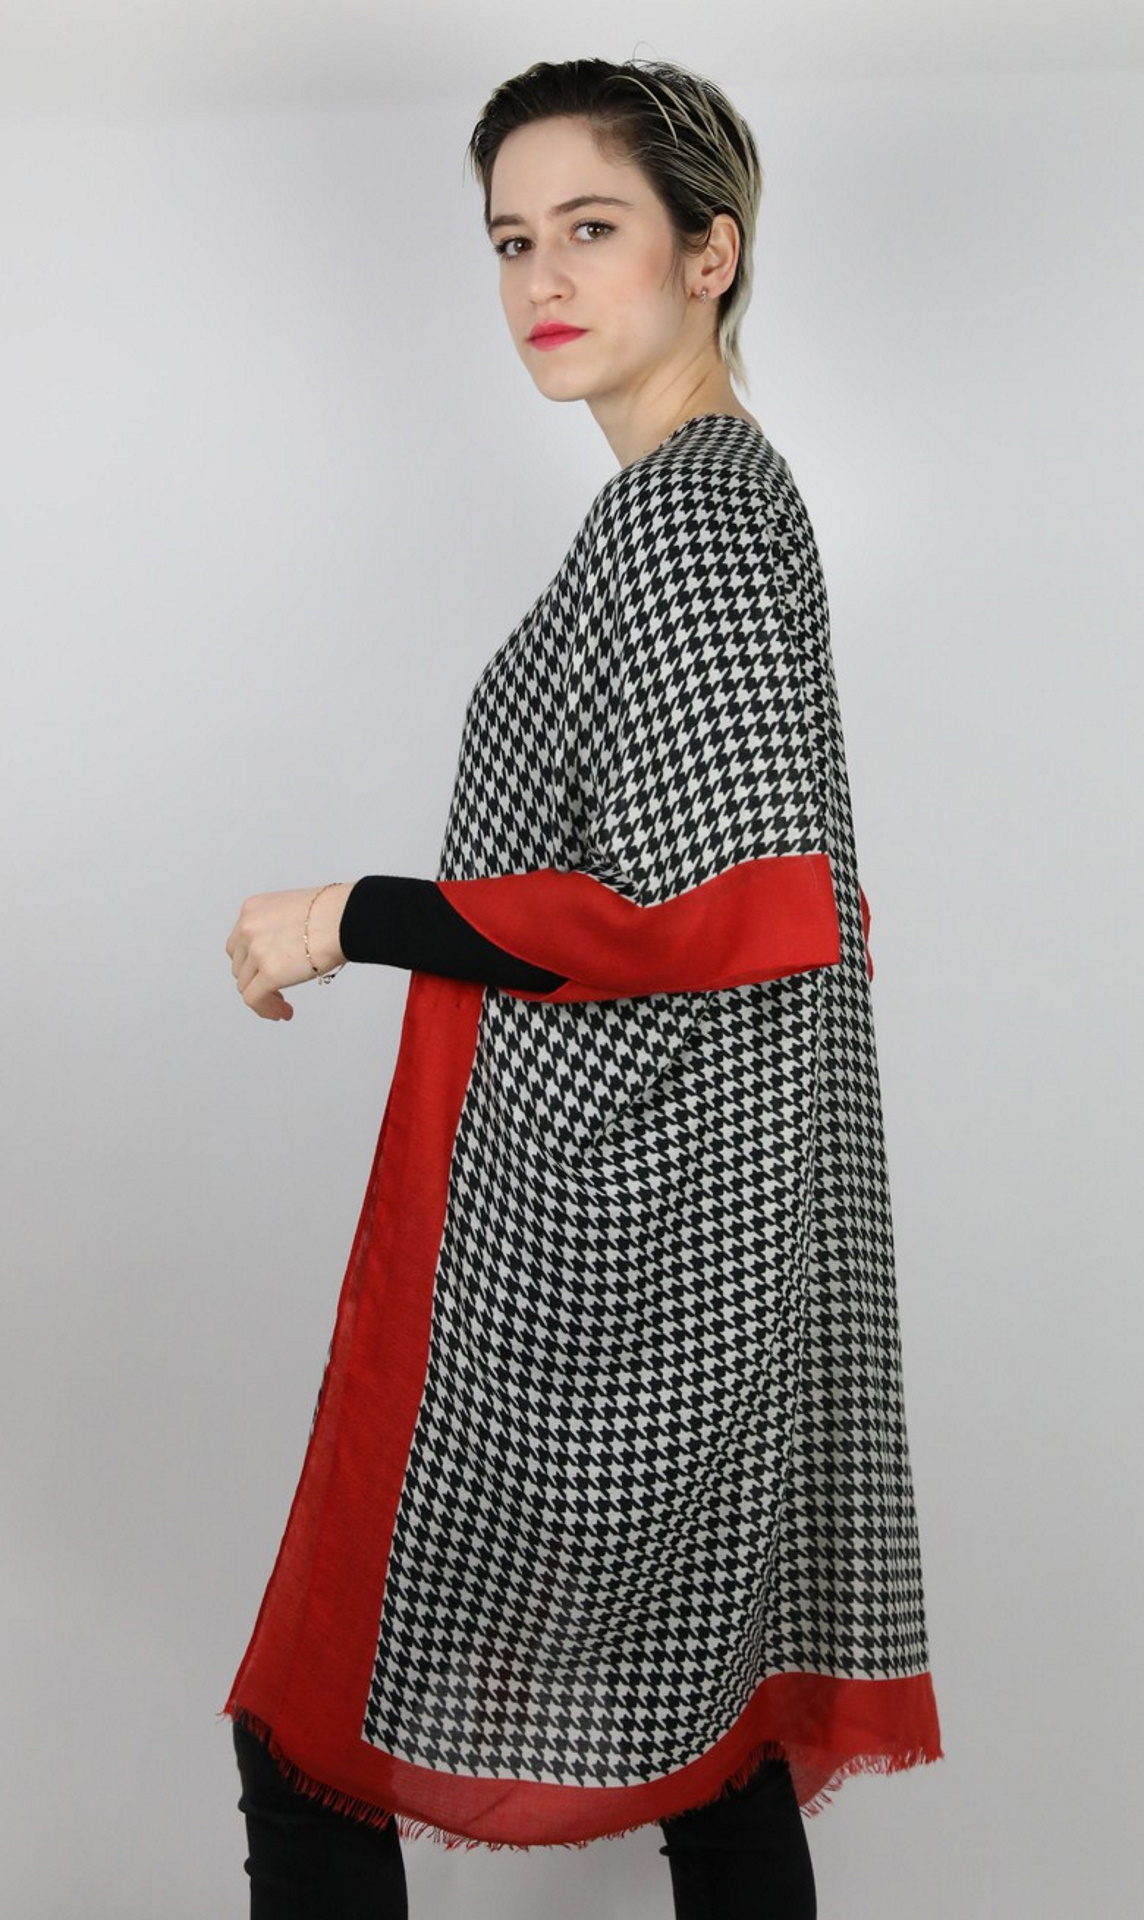 CLOTHES05 STOLA DONNA FOULARD CARDIGAN COPRISPALLE 2 1stAmerican elegante stola da donna foulard cardigan coprispalle